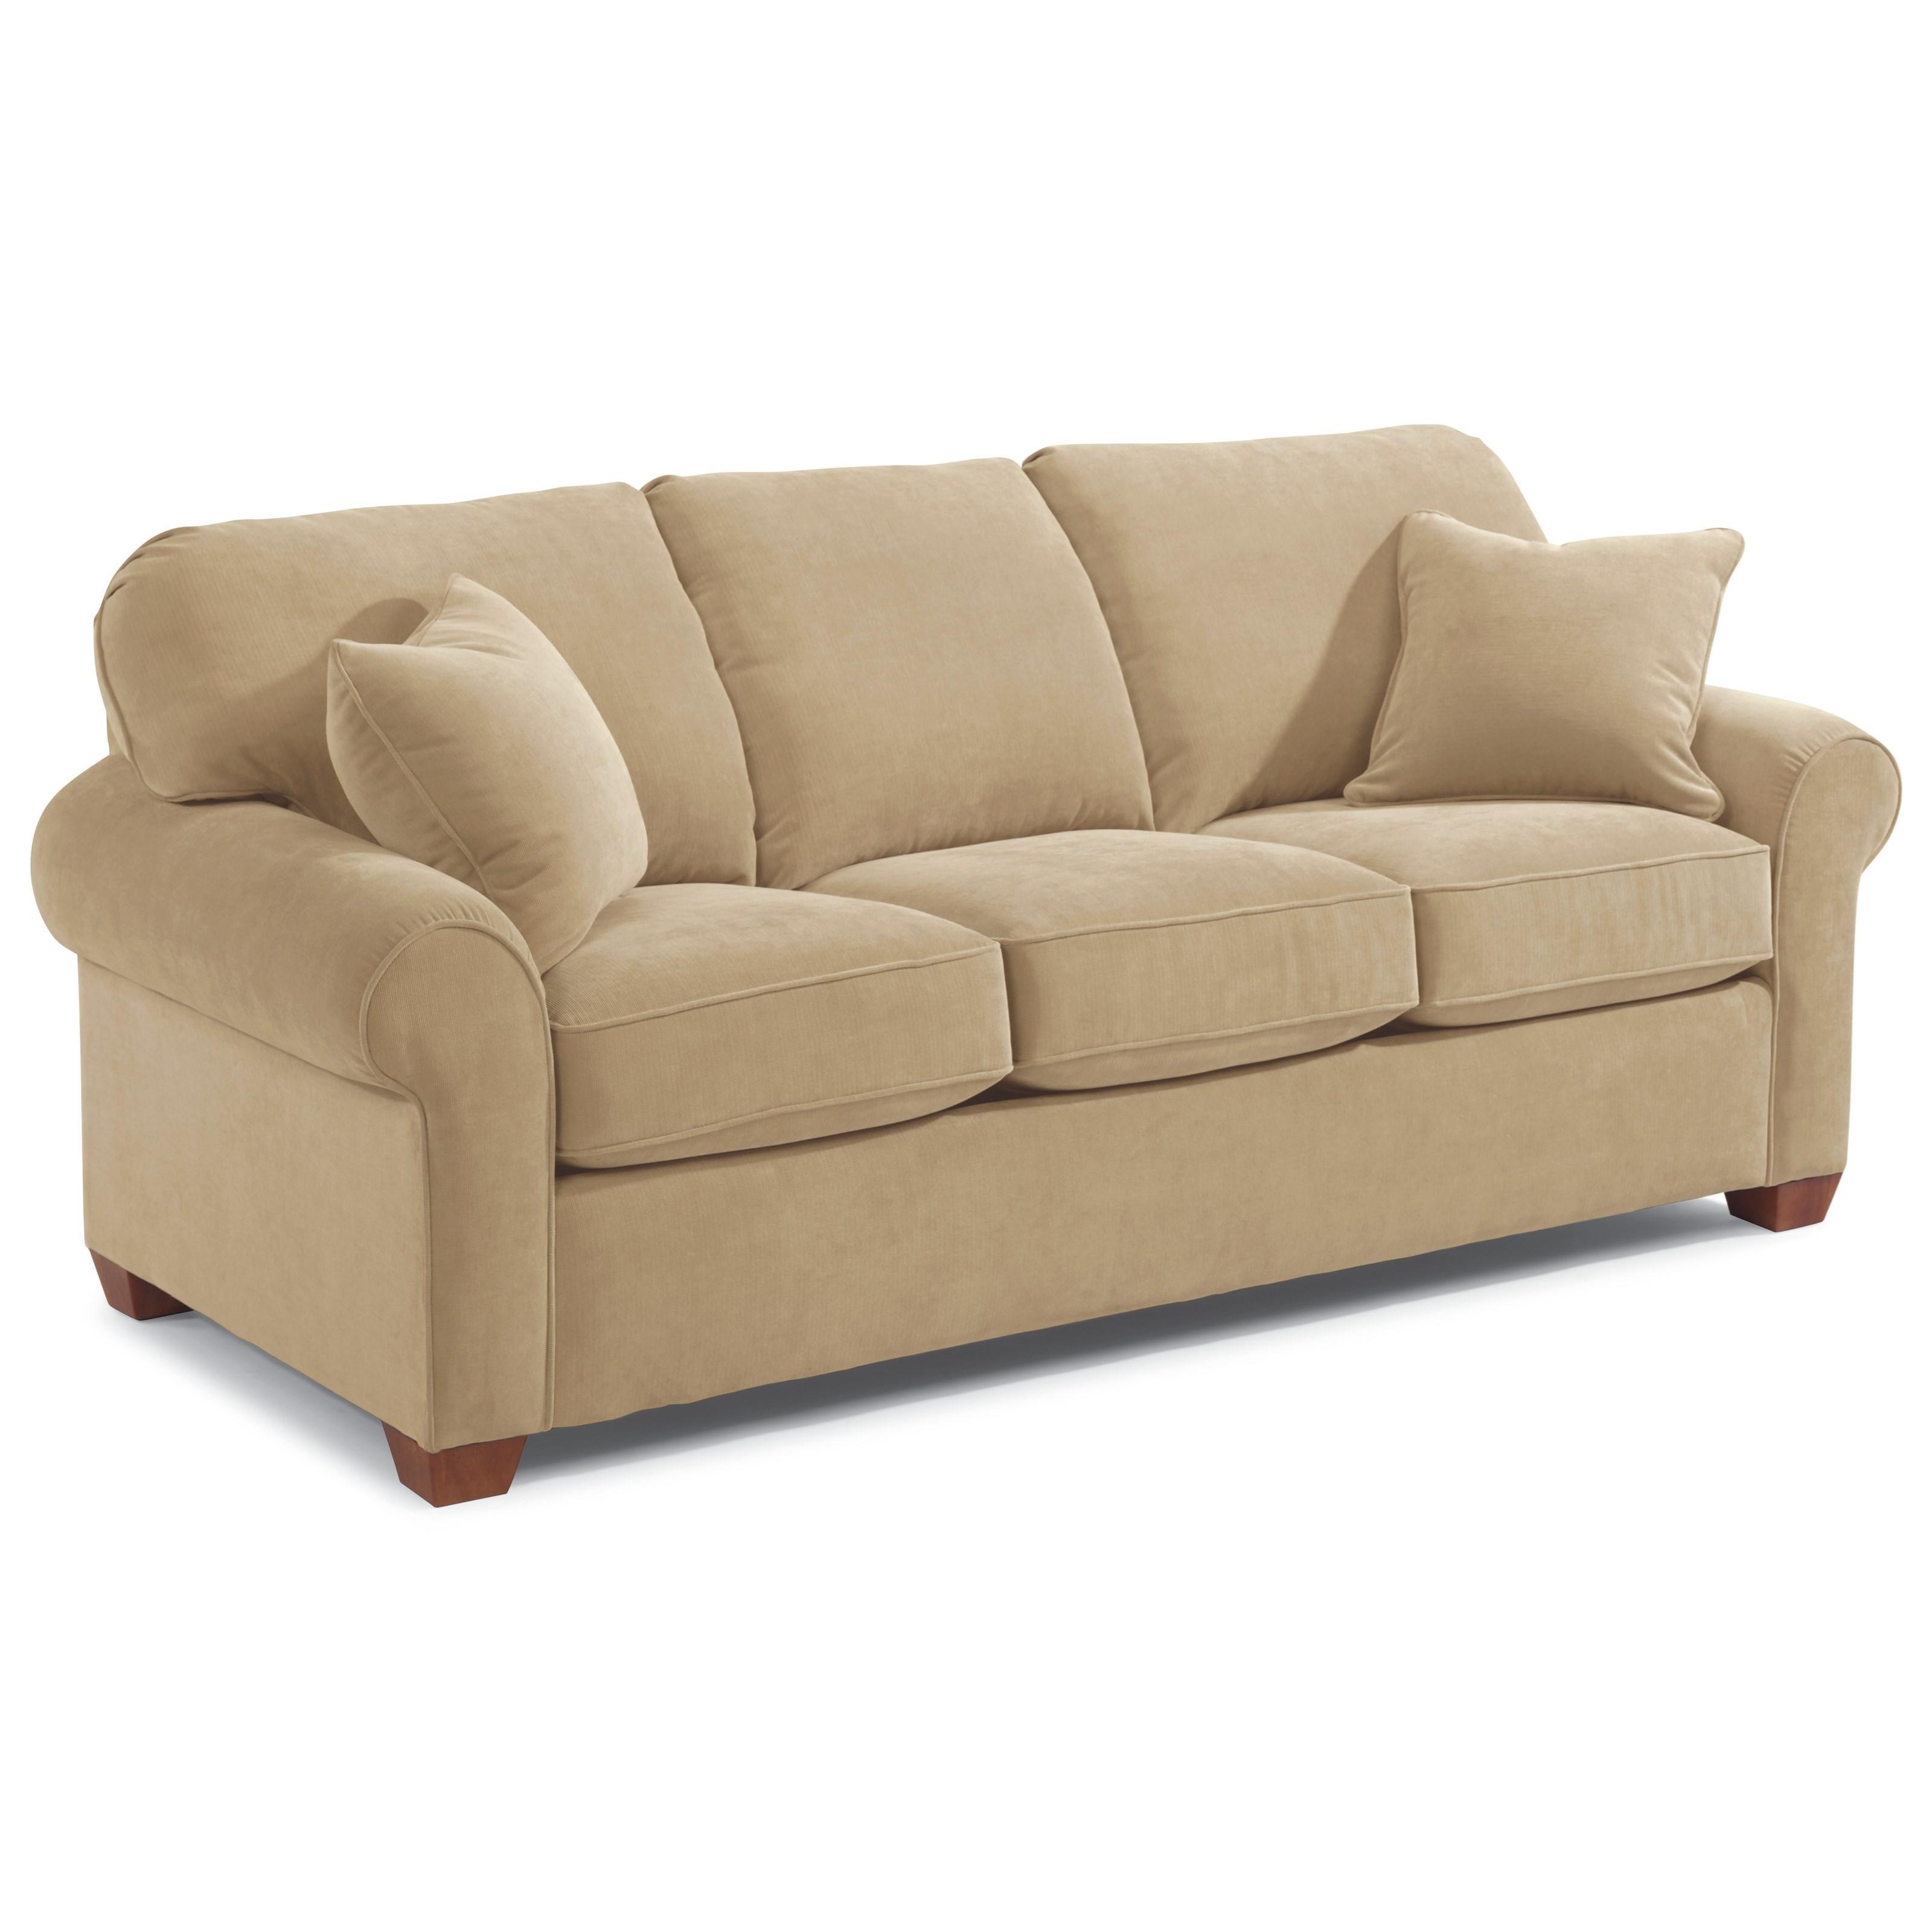 quality queen sleeper sofa who makes the best flexsteel thornton 5535 44 john v